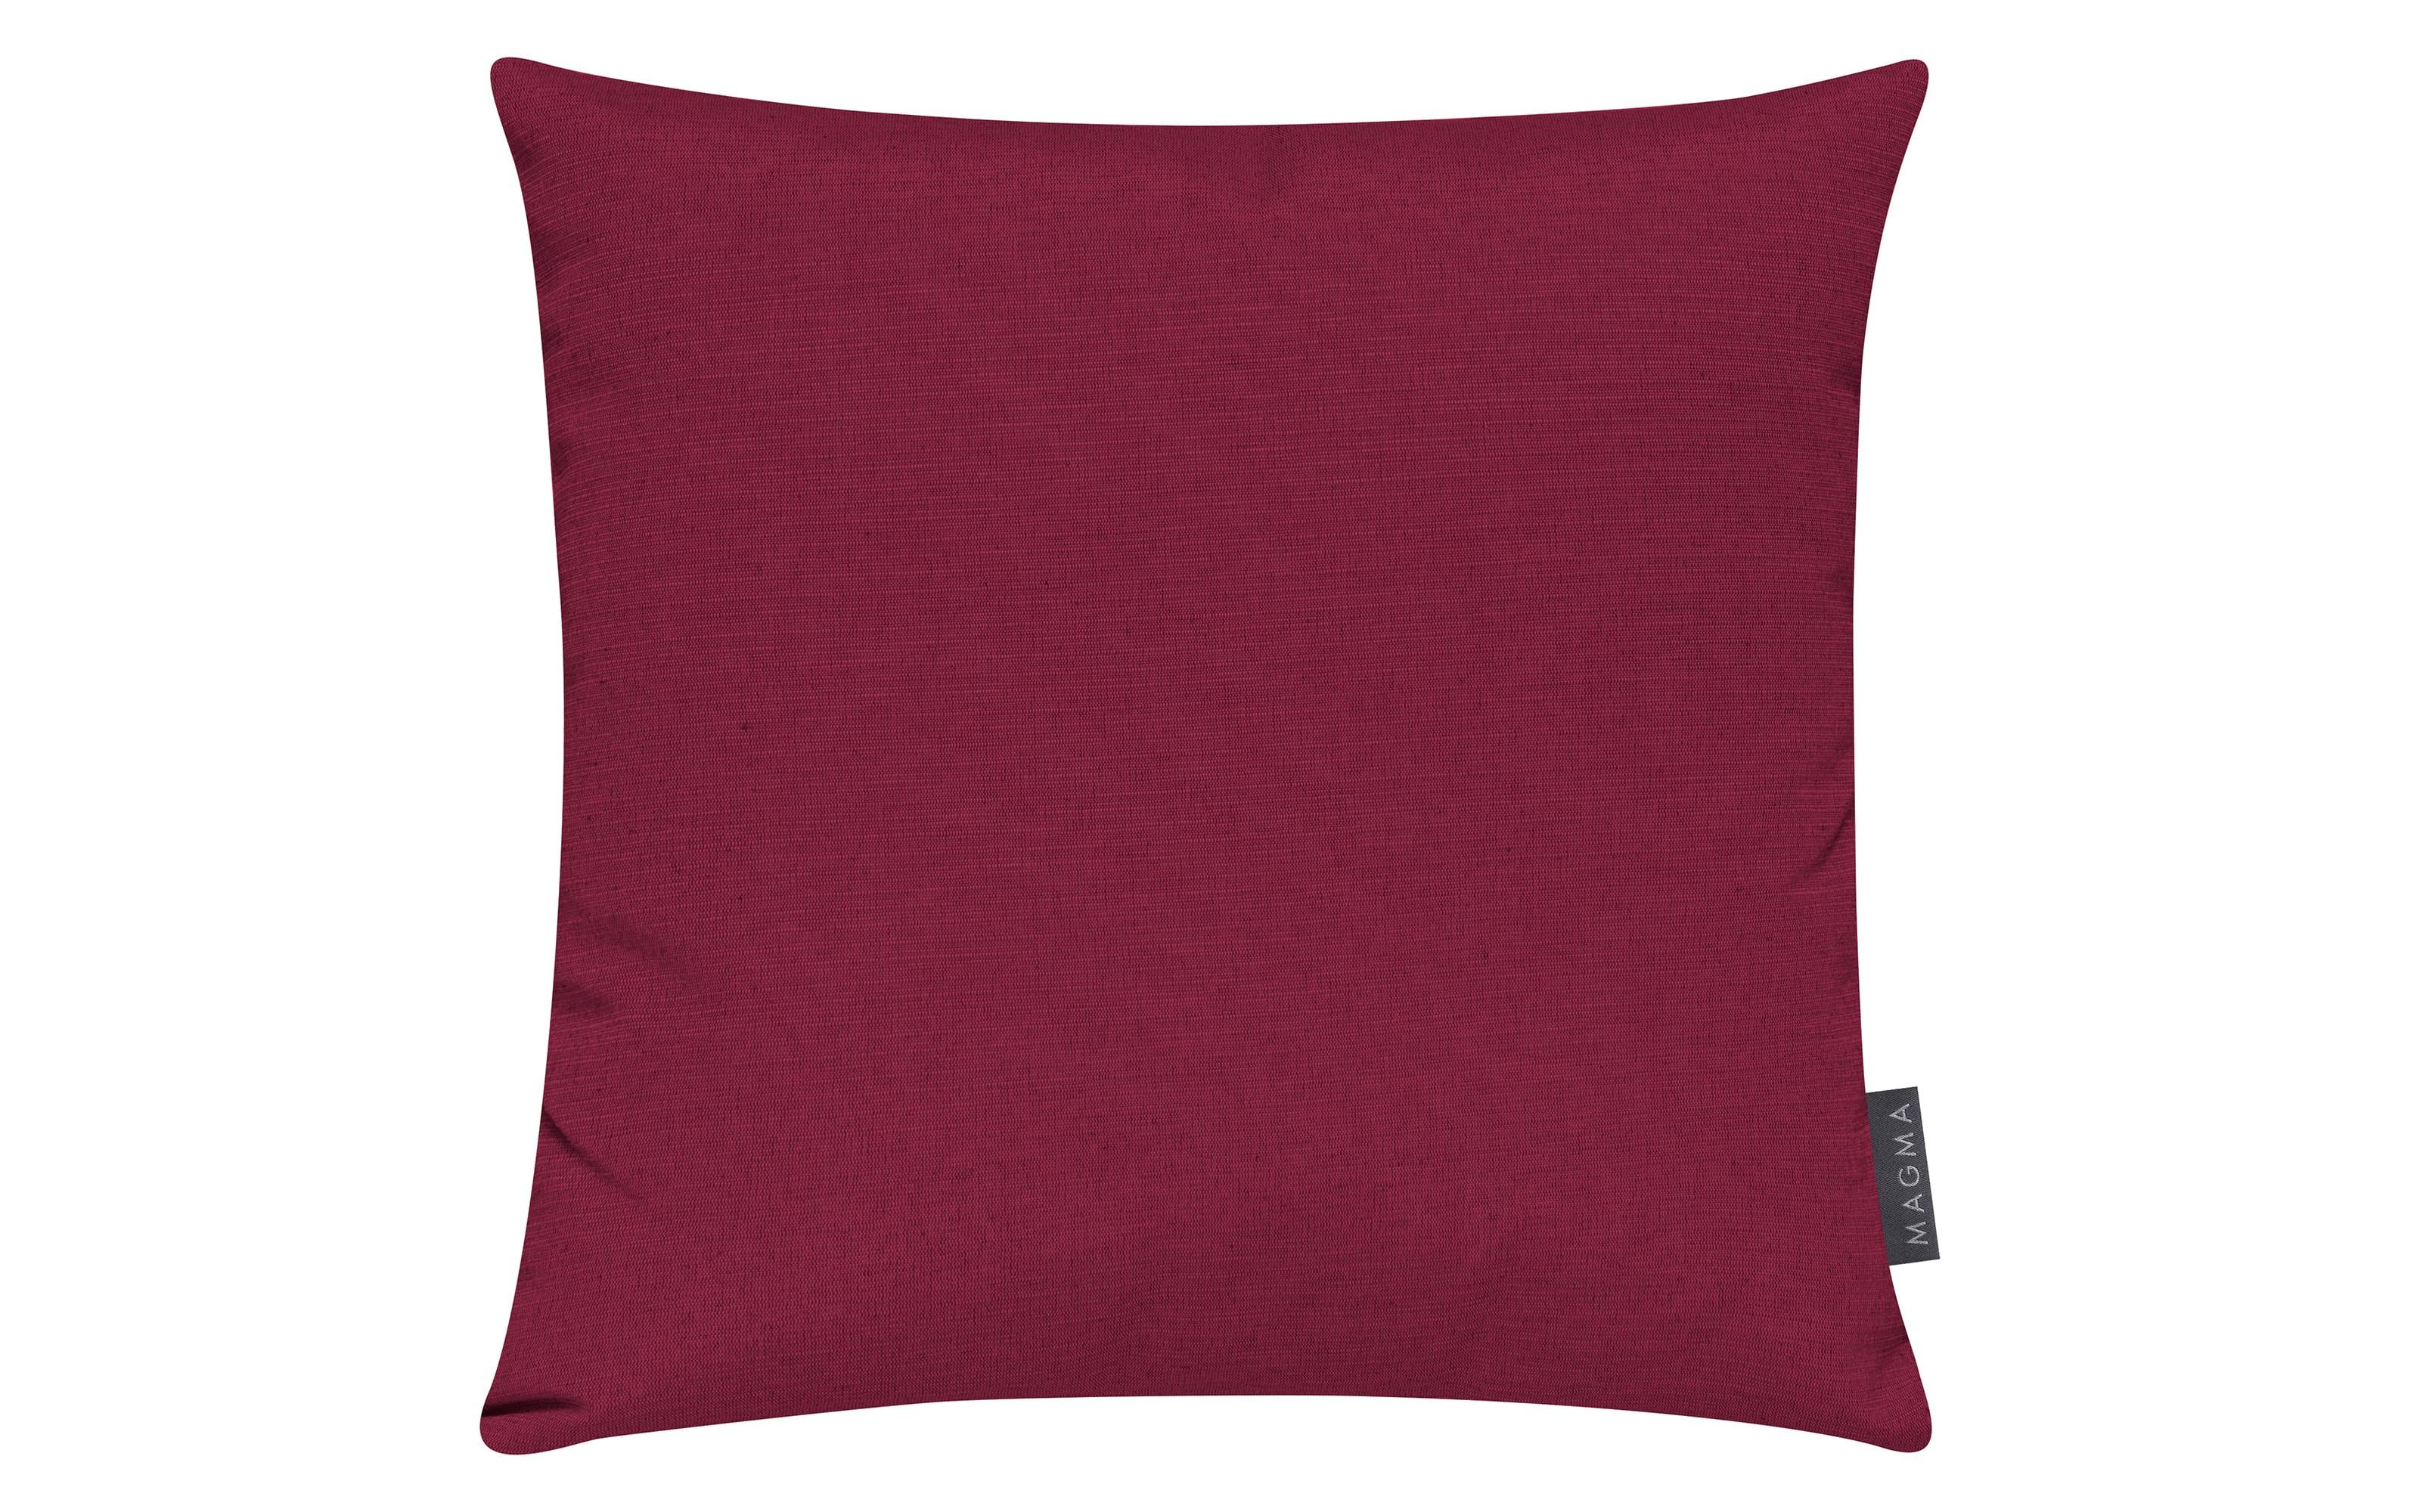 Kissenhülle Fino in rot, 50 x 50 cm